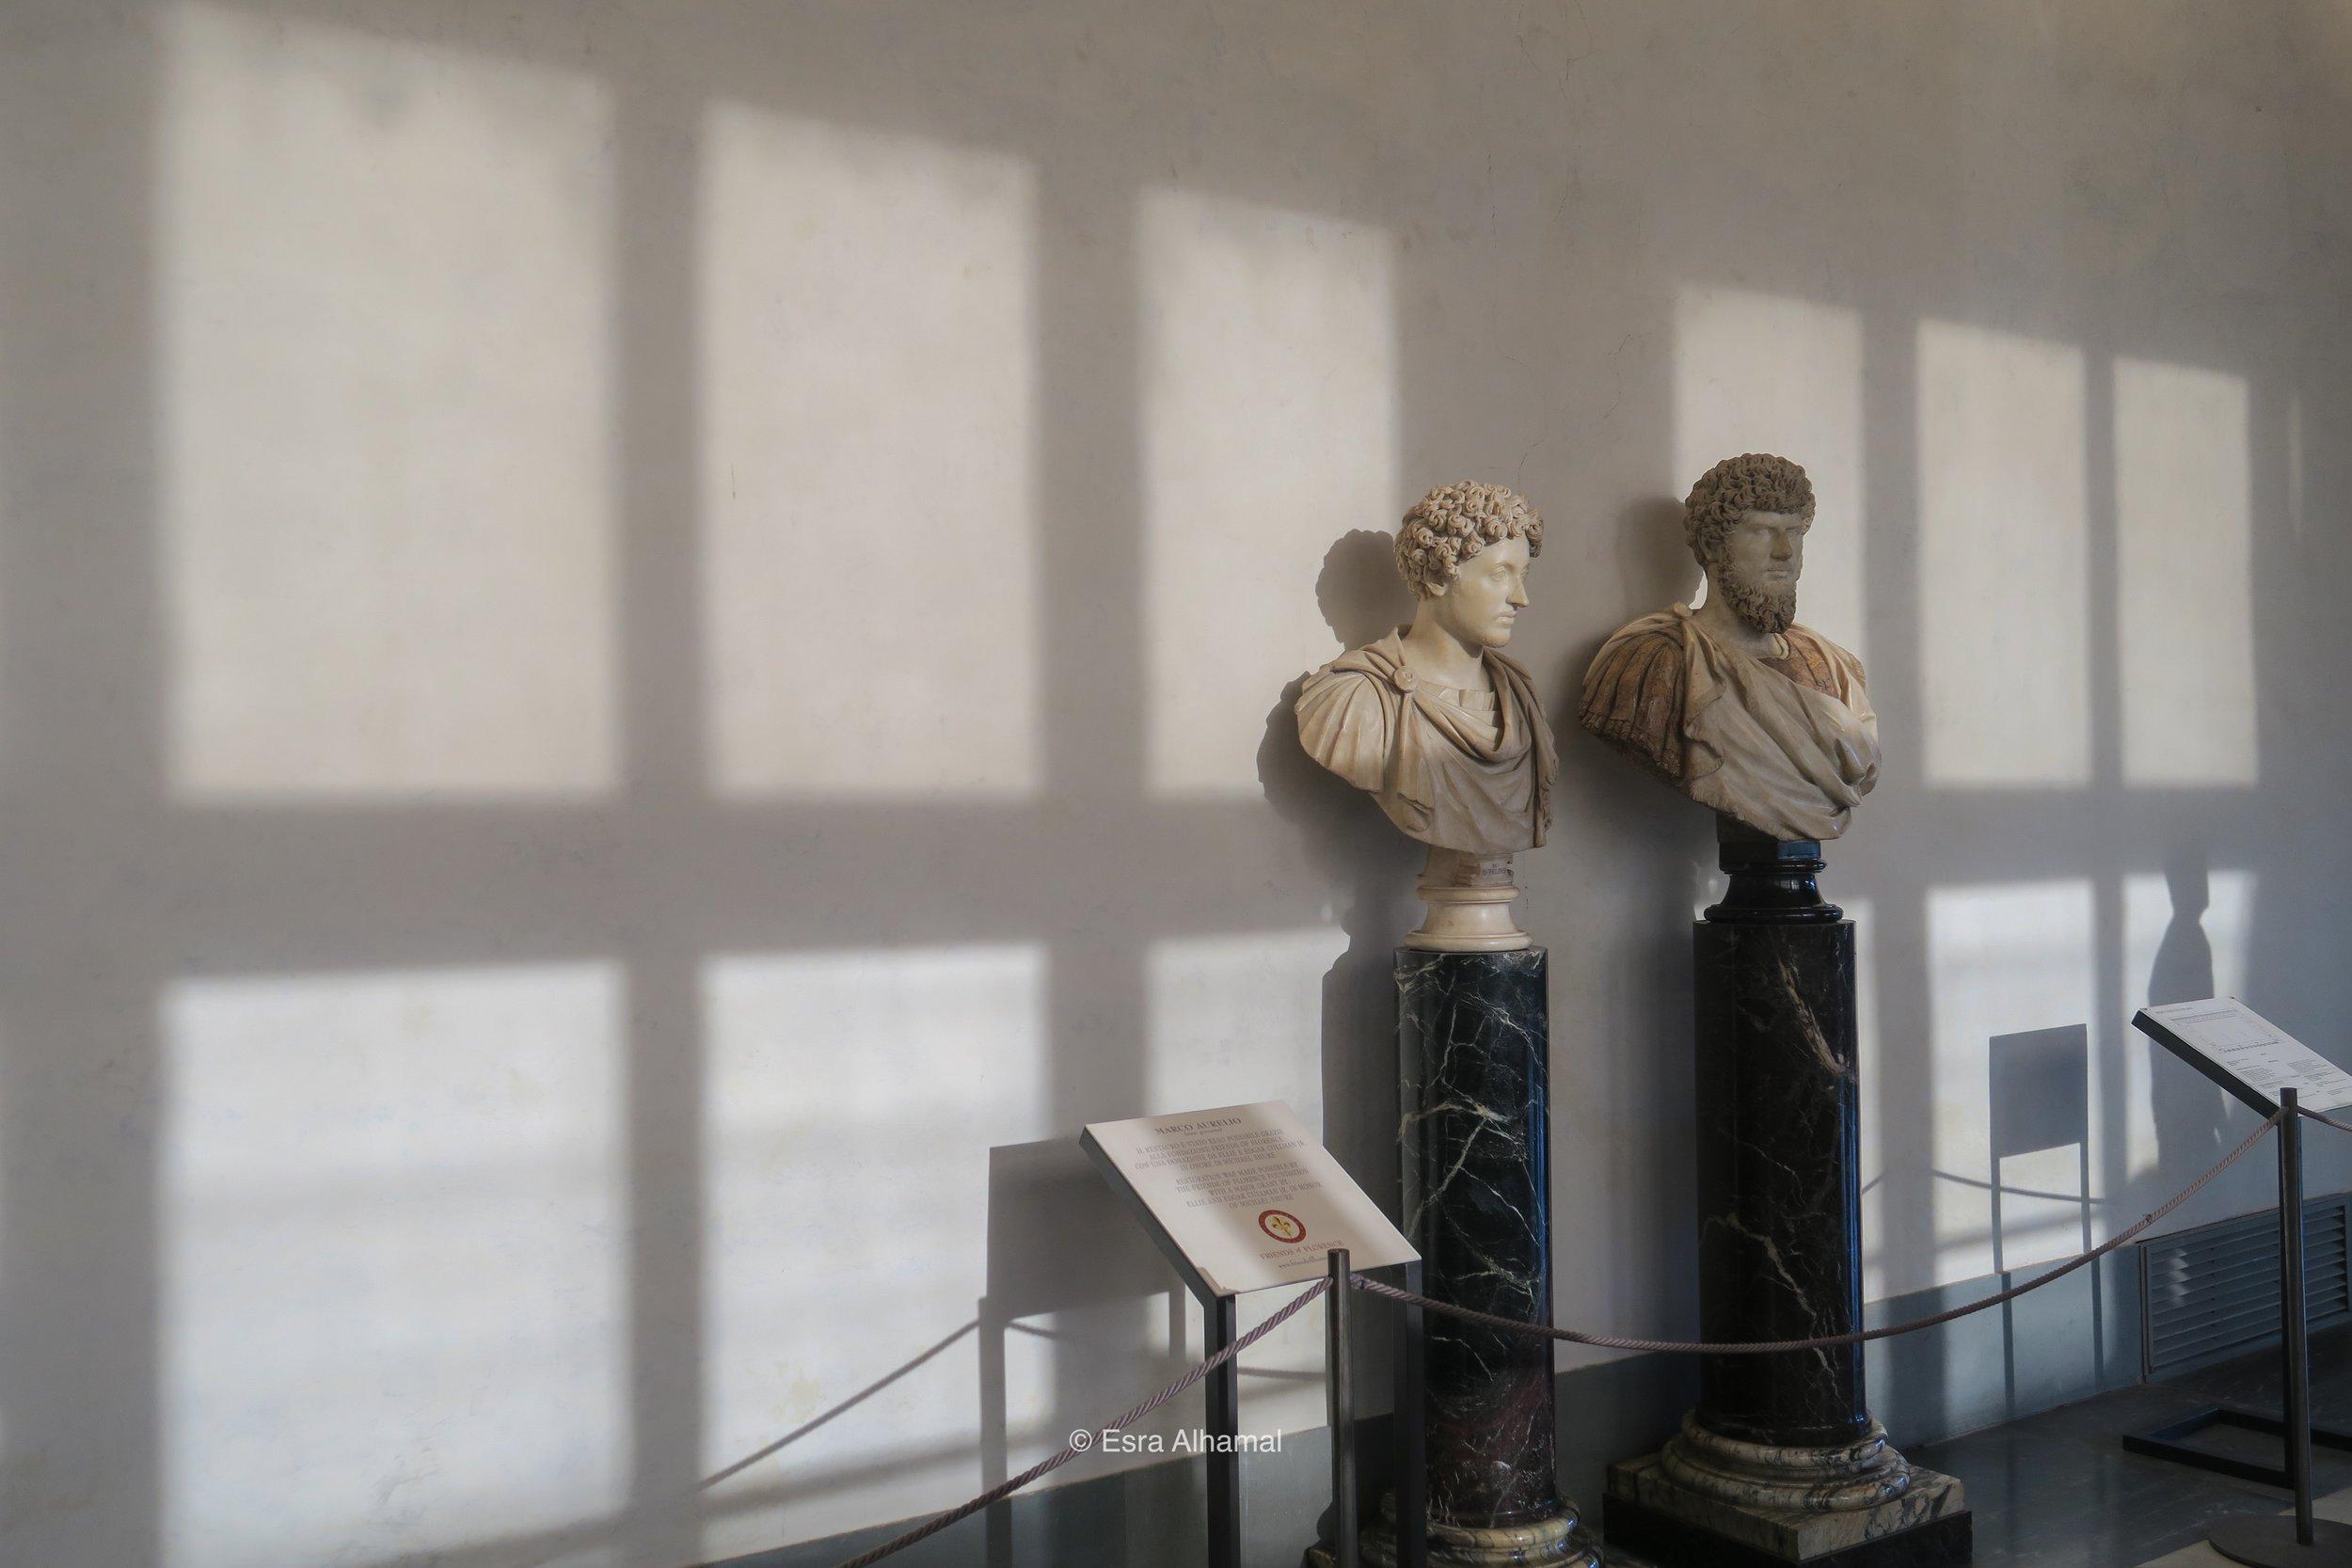 Uffuzzi Gallery